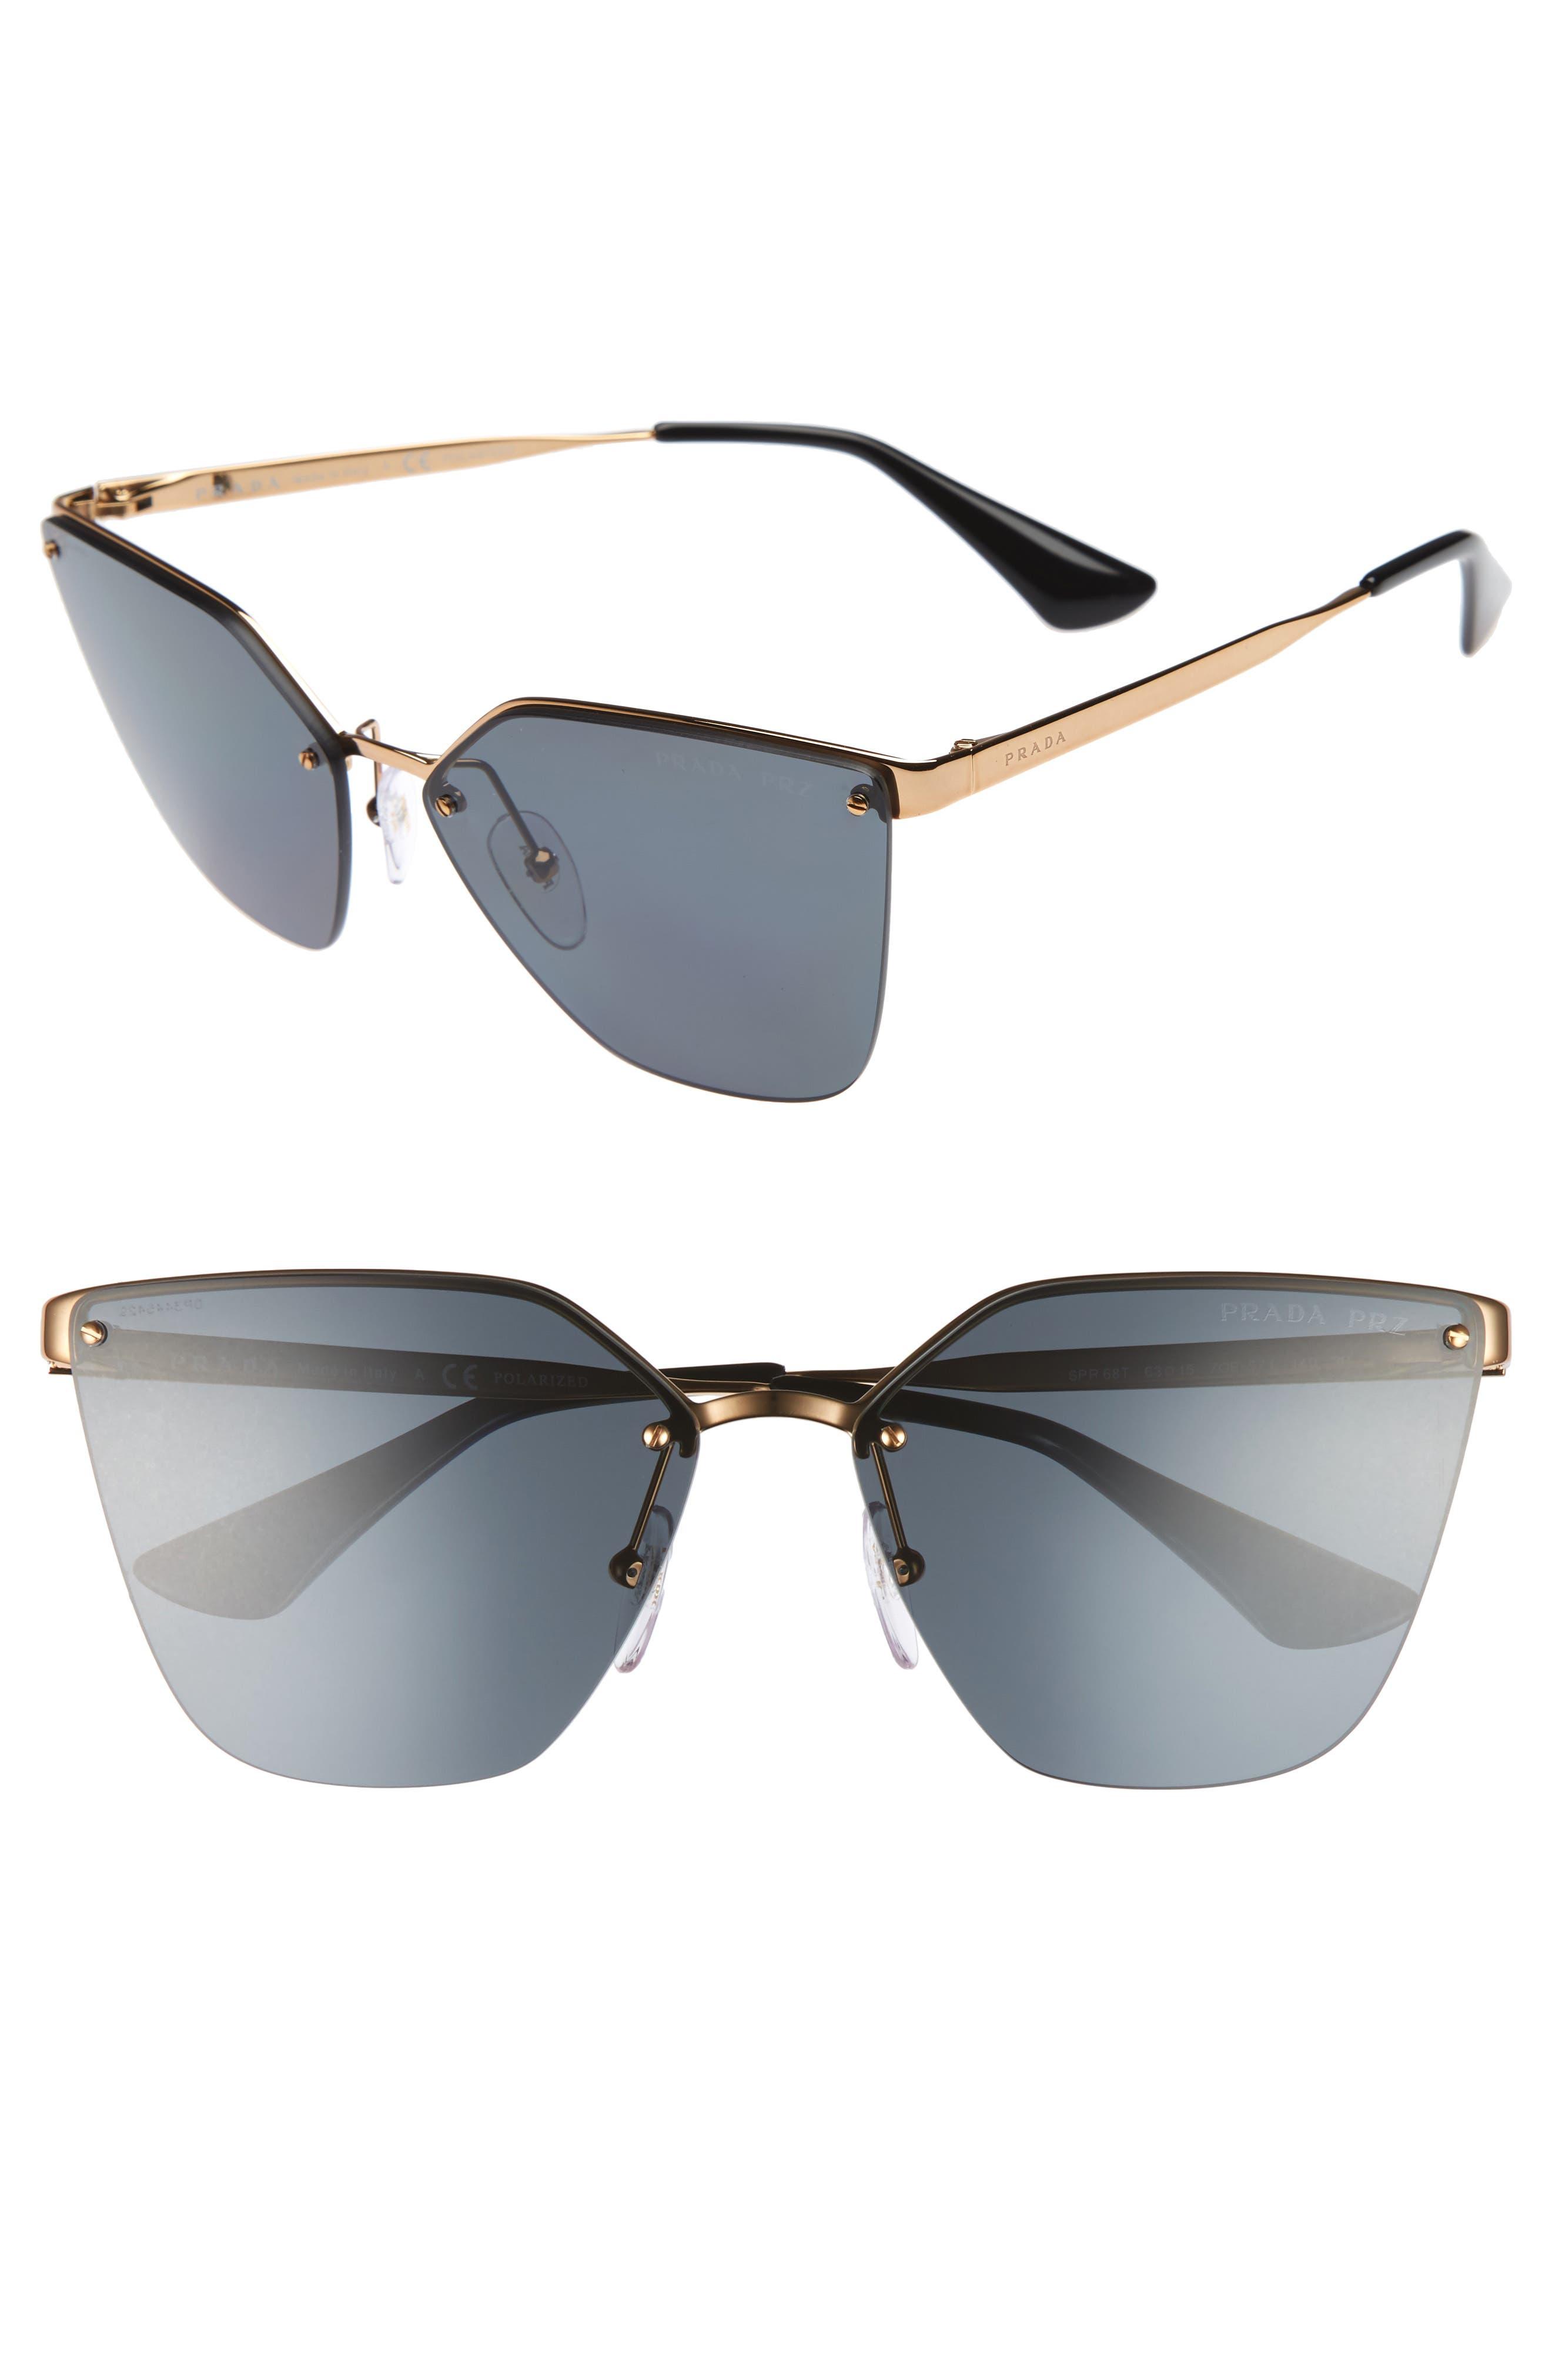 63mm Oversize Rimless Sunglasses,                         Main,                         color, Black/ Green